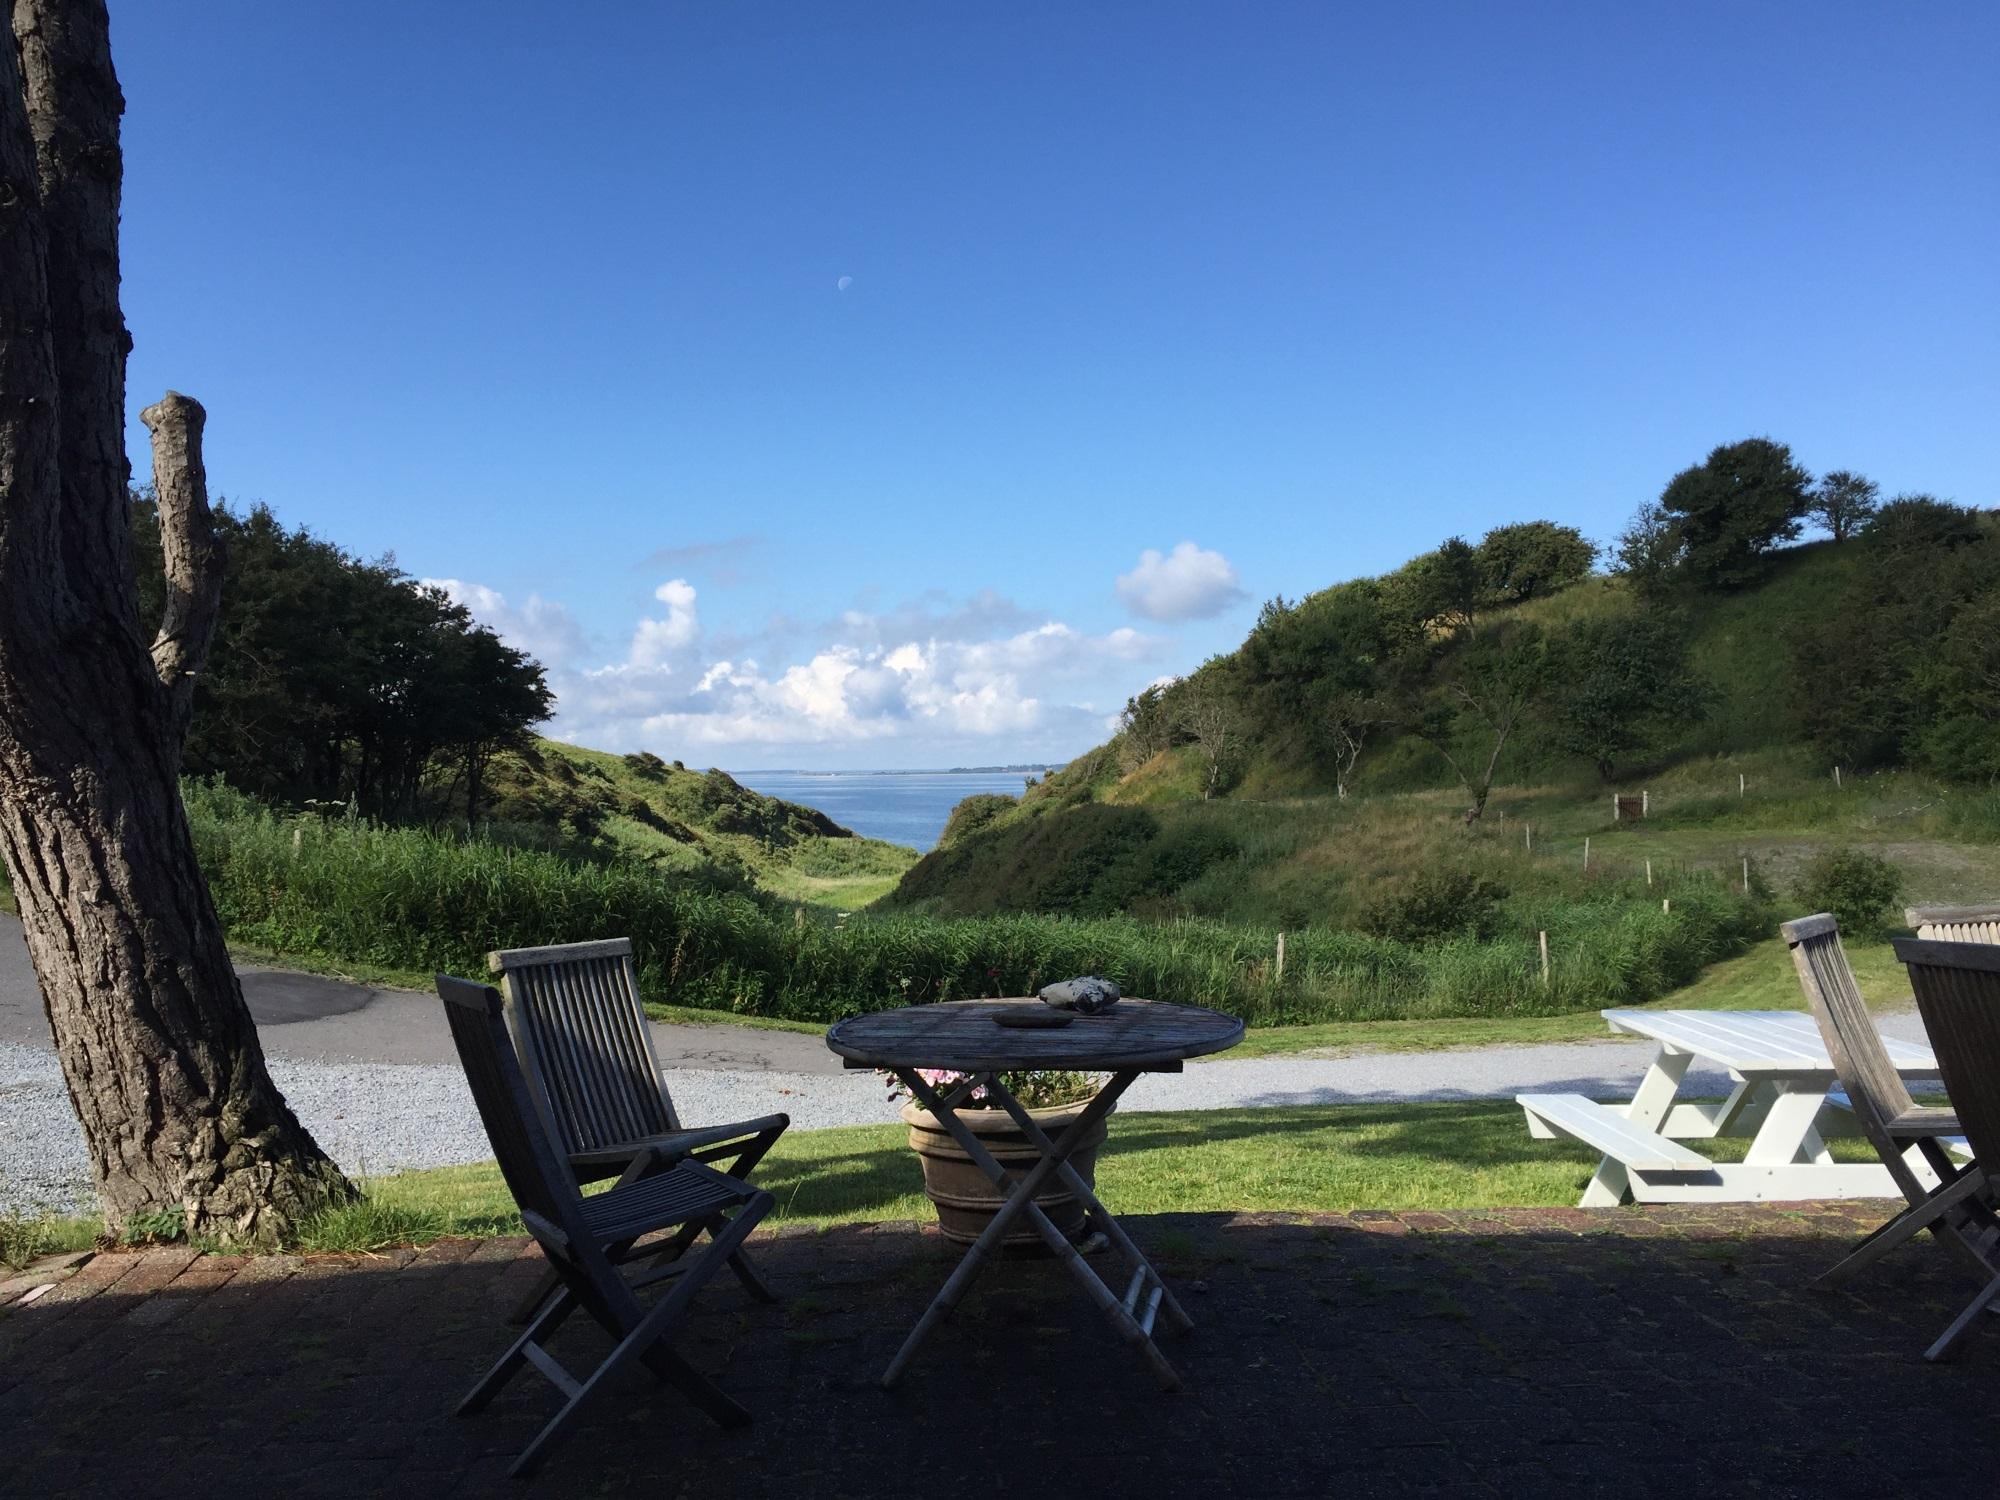 Reisetipp des Monats – Næsbydale Badehotel